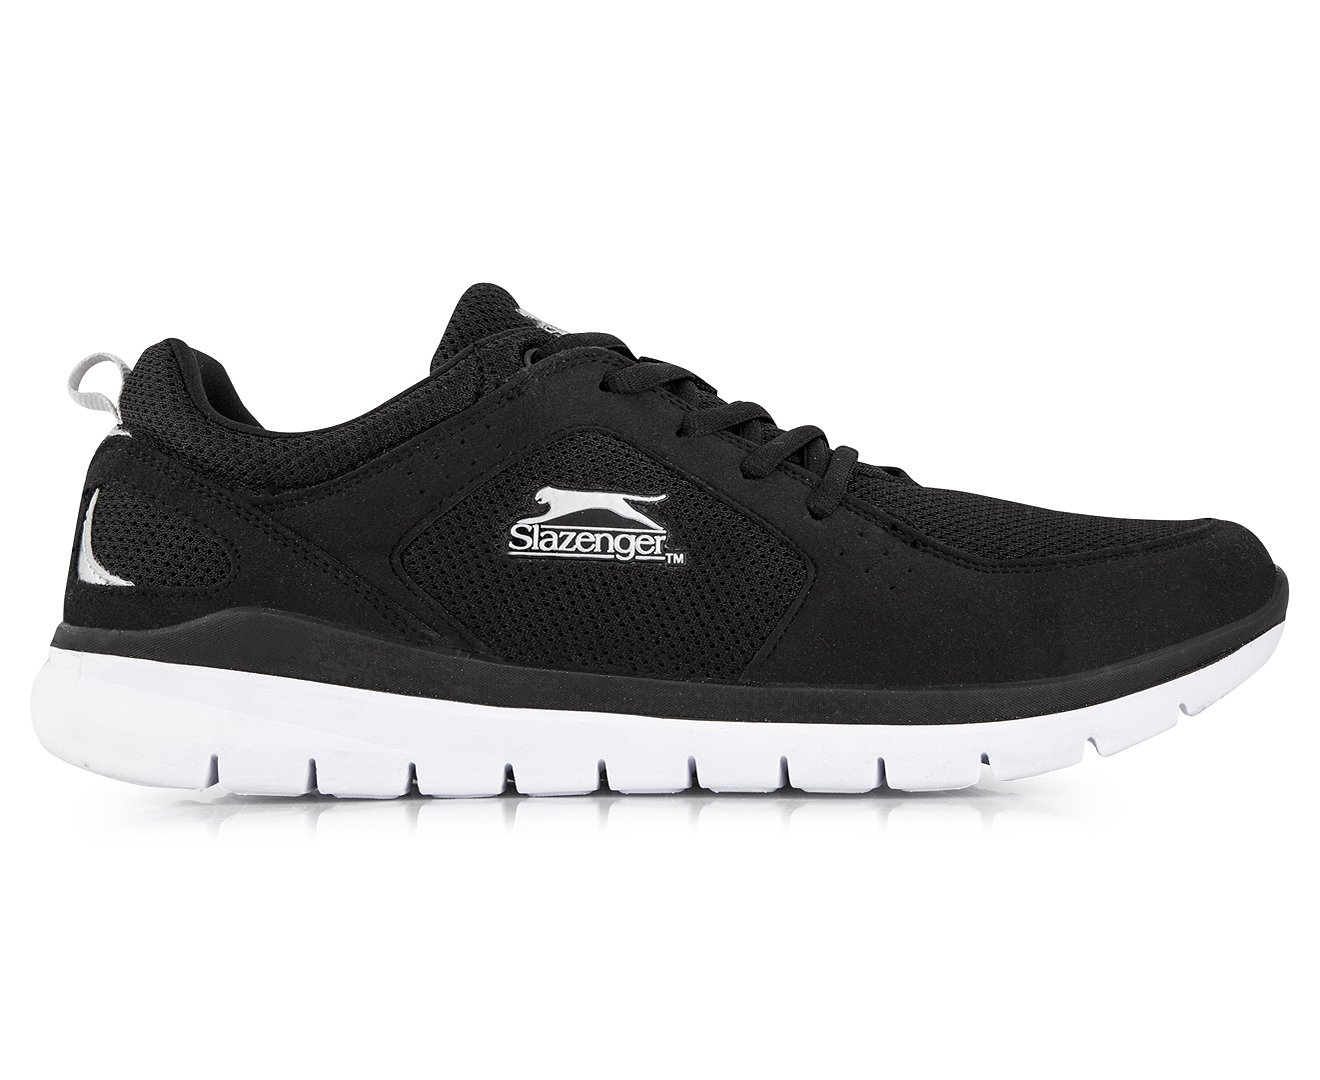 Slazenger Shoes Australia